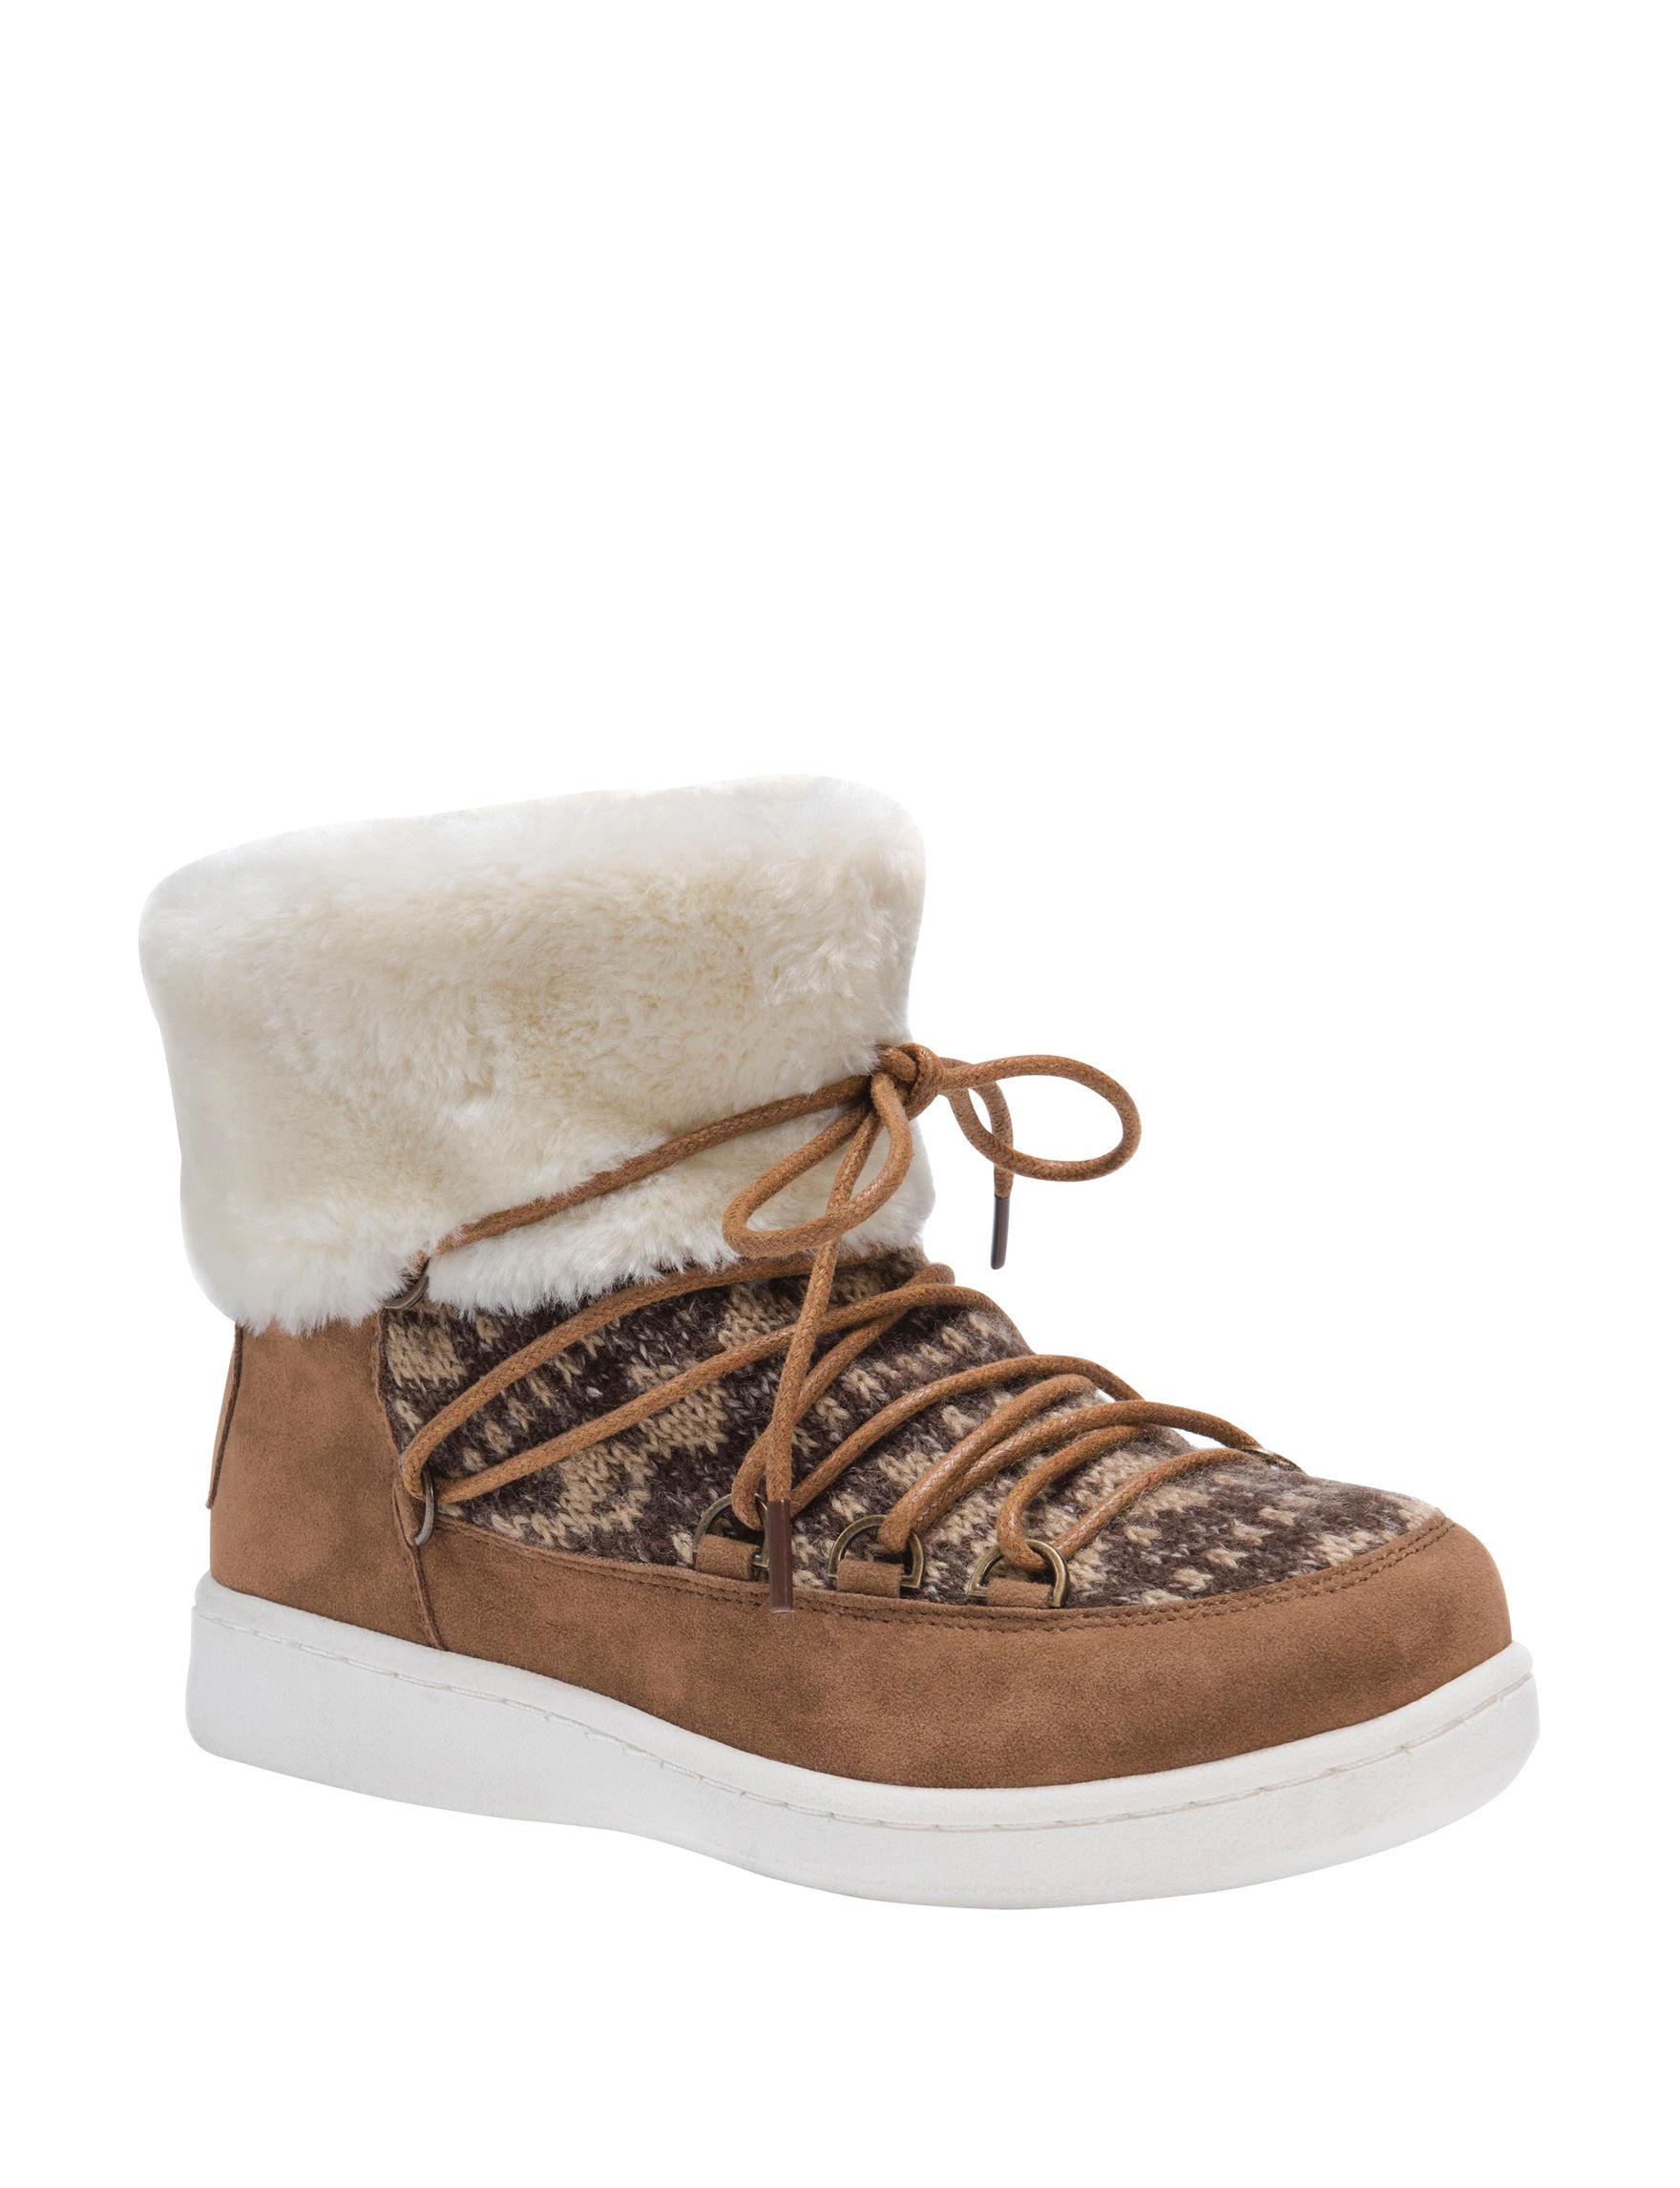 Muk Luks Tan Winter Boots